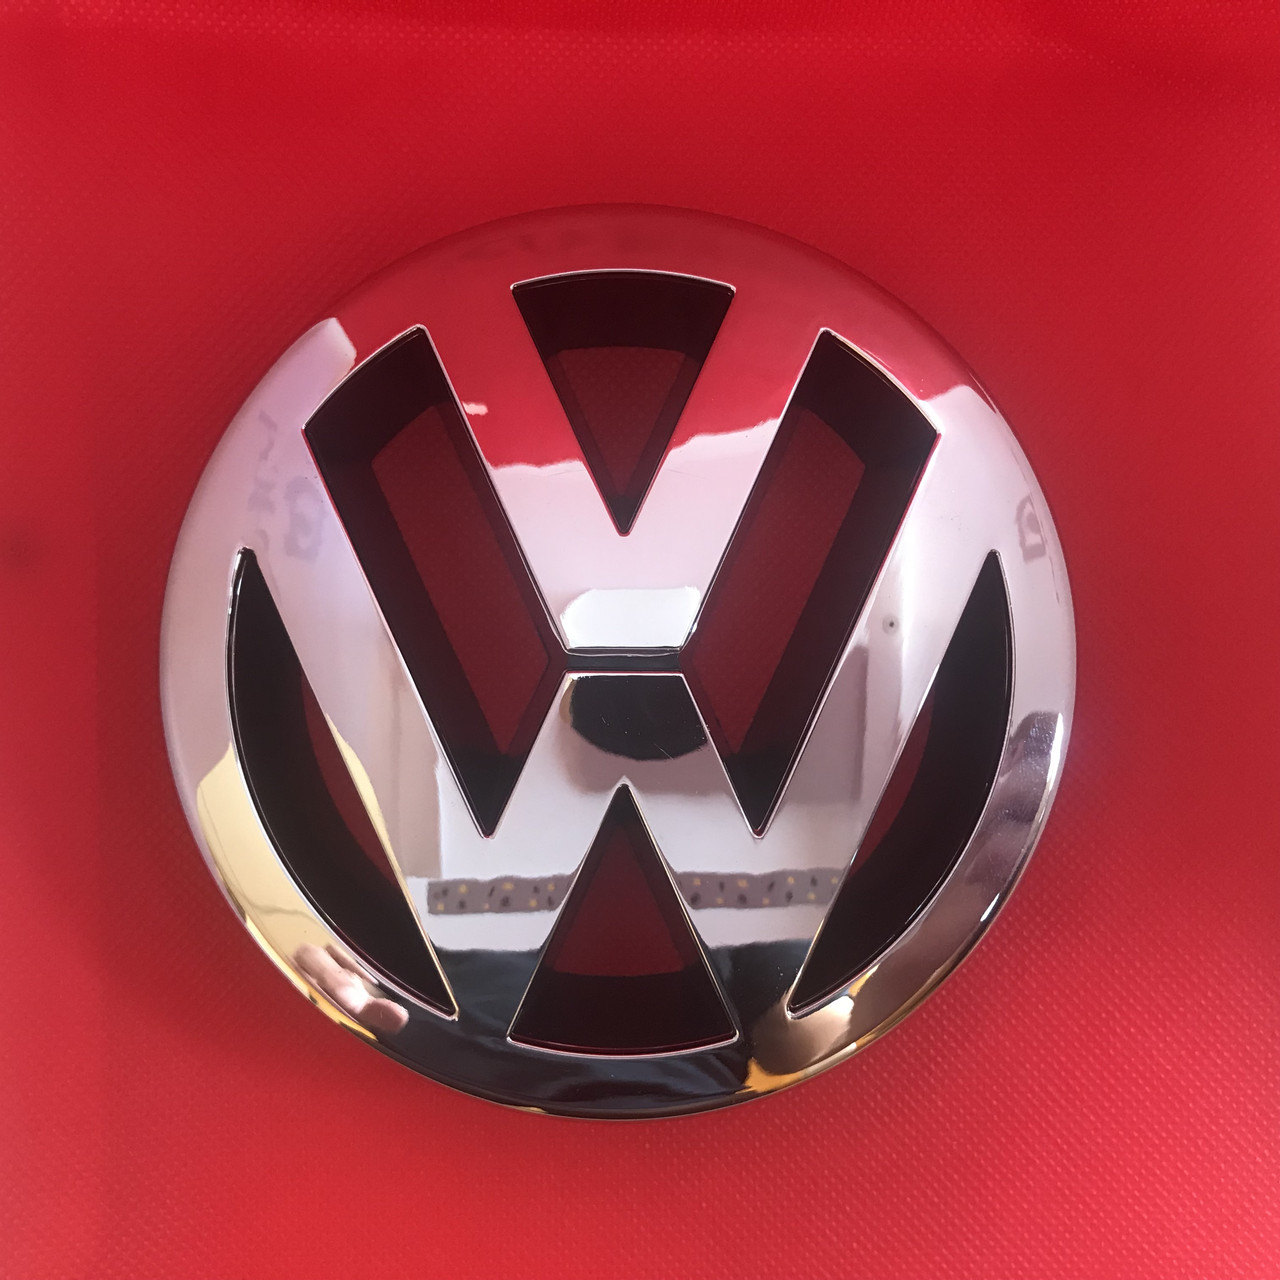 Эмблема логотип Volkswagen Фольксваген  VW Golf 5  Polo 02-09, Caddy 04-09, на решетку радиатора 1T0853601A